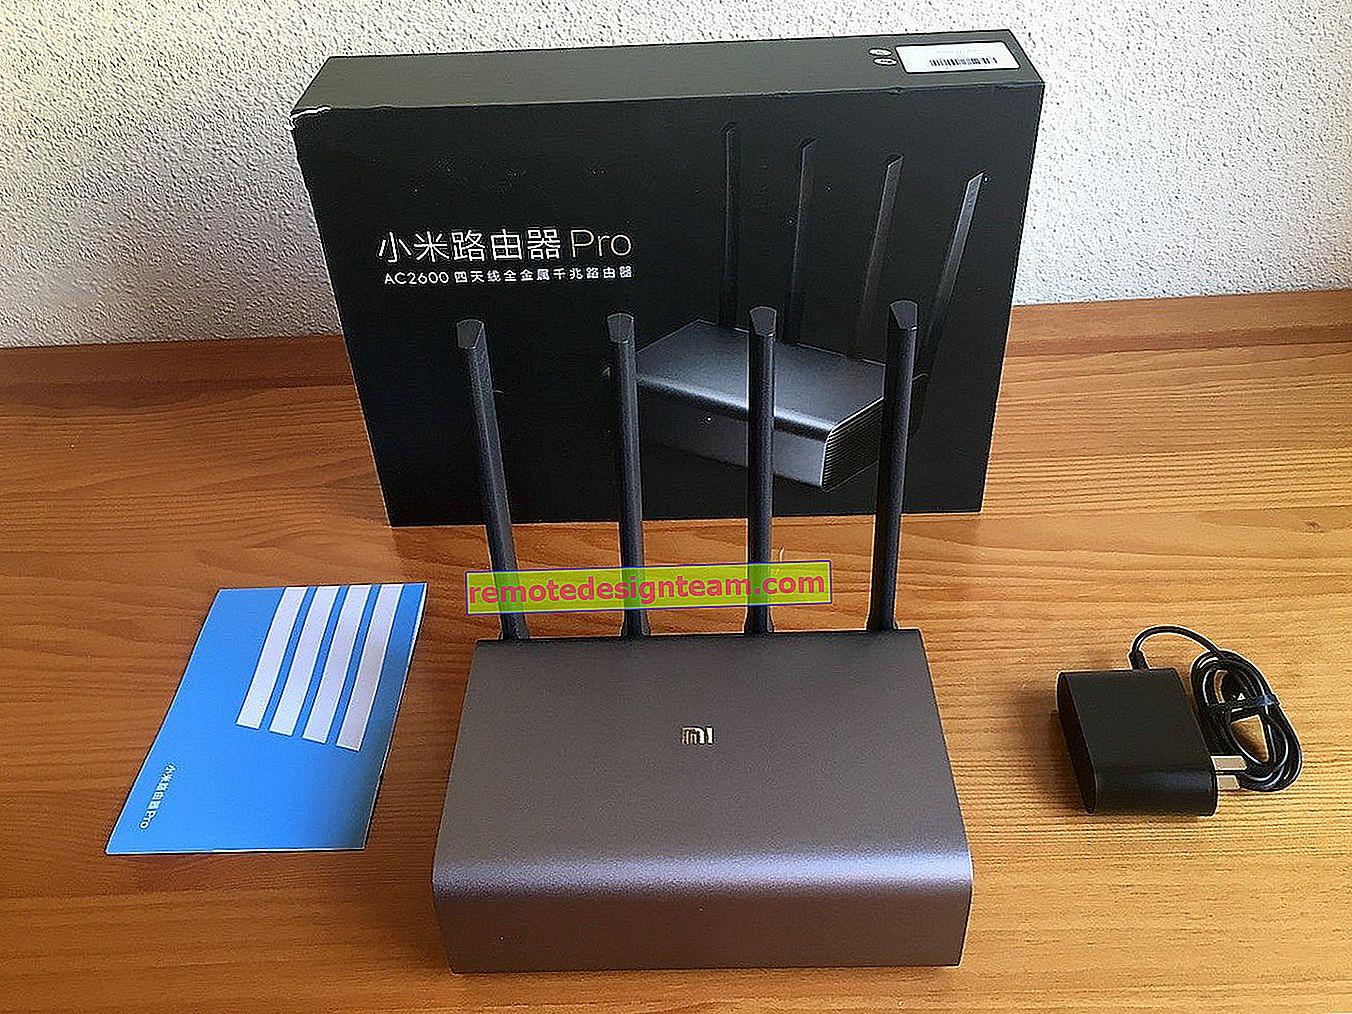 Xiaomi Mi Wi-Fi Router 3'ü bağlama ve yapılandırma